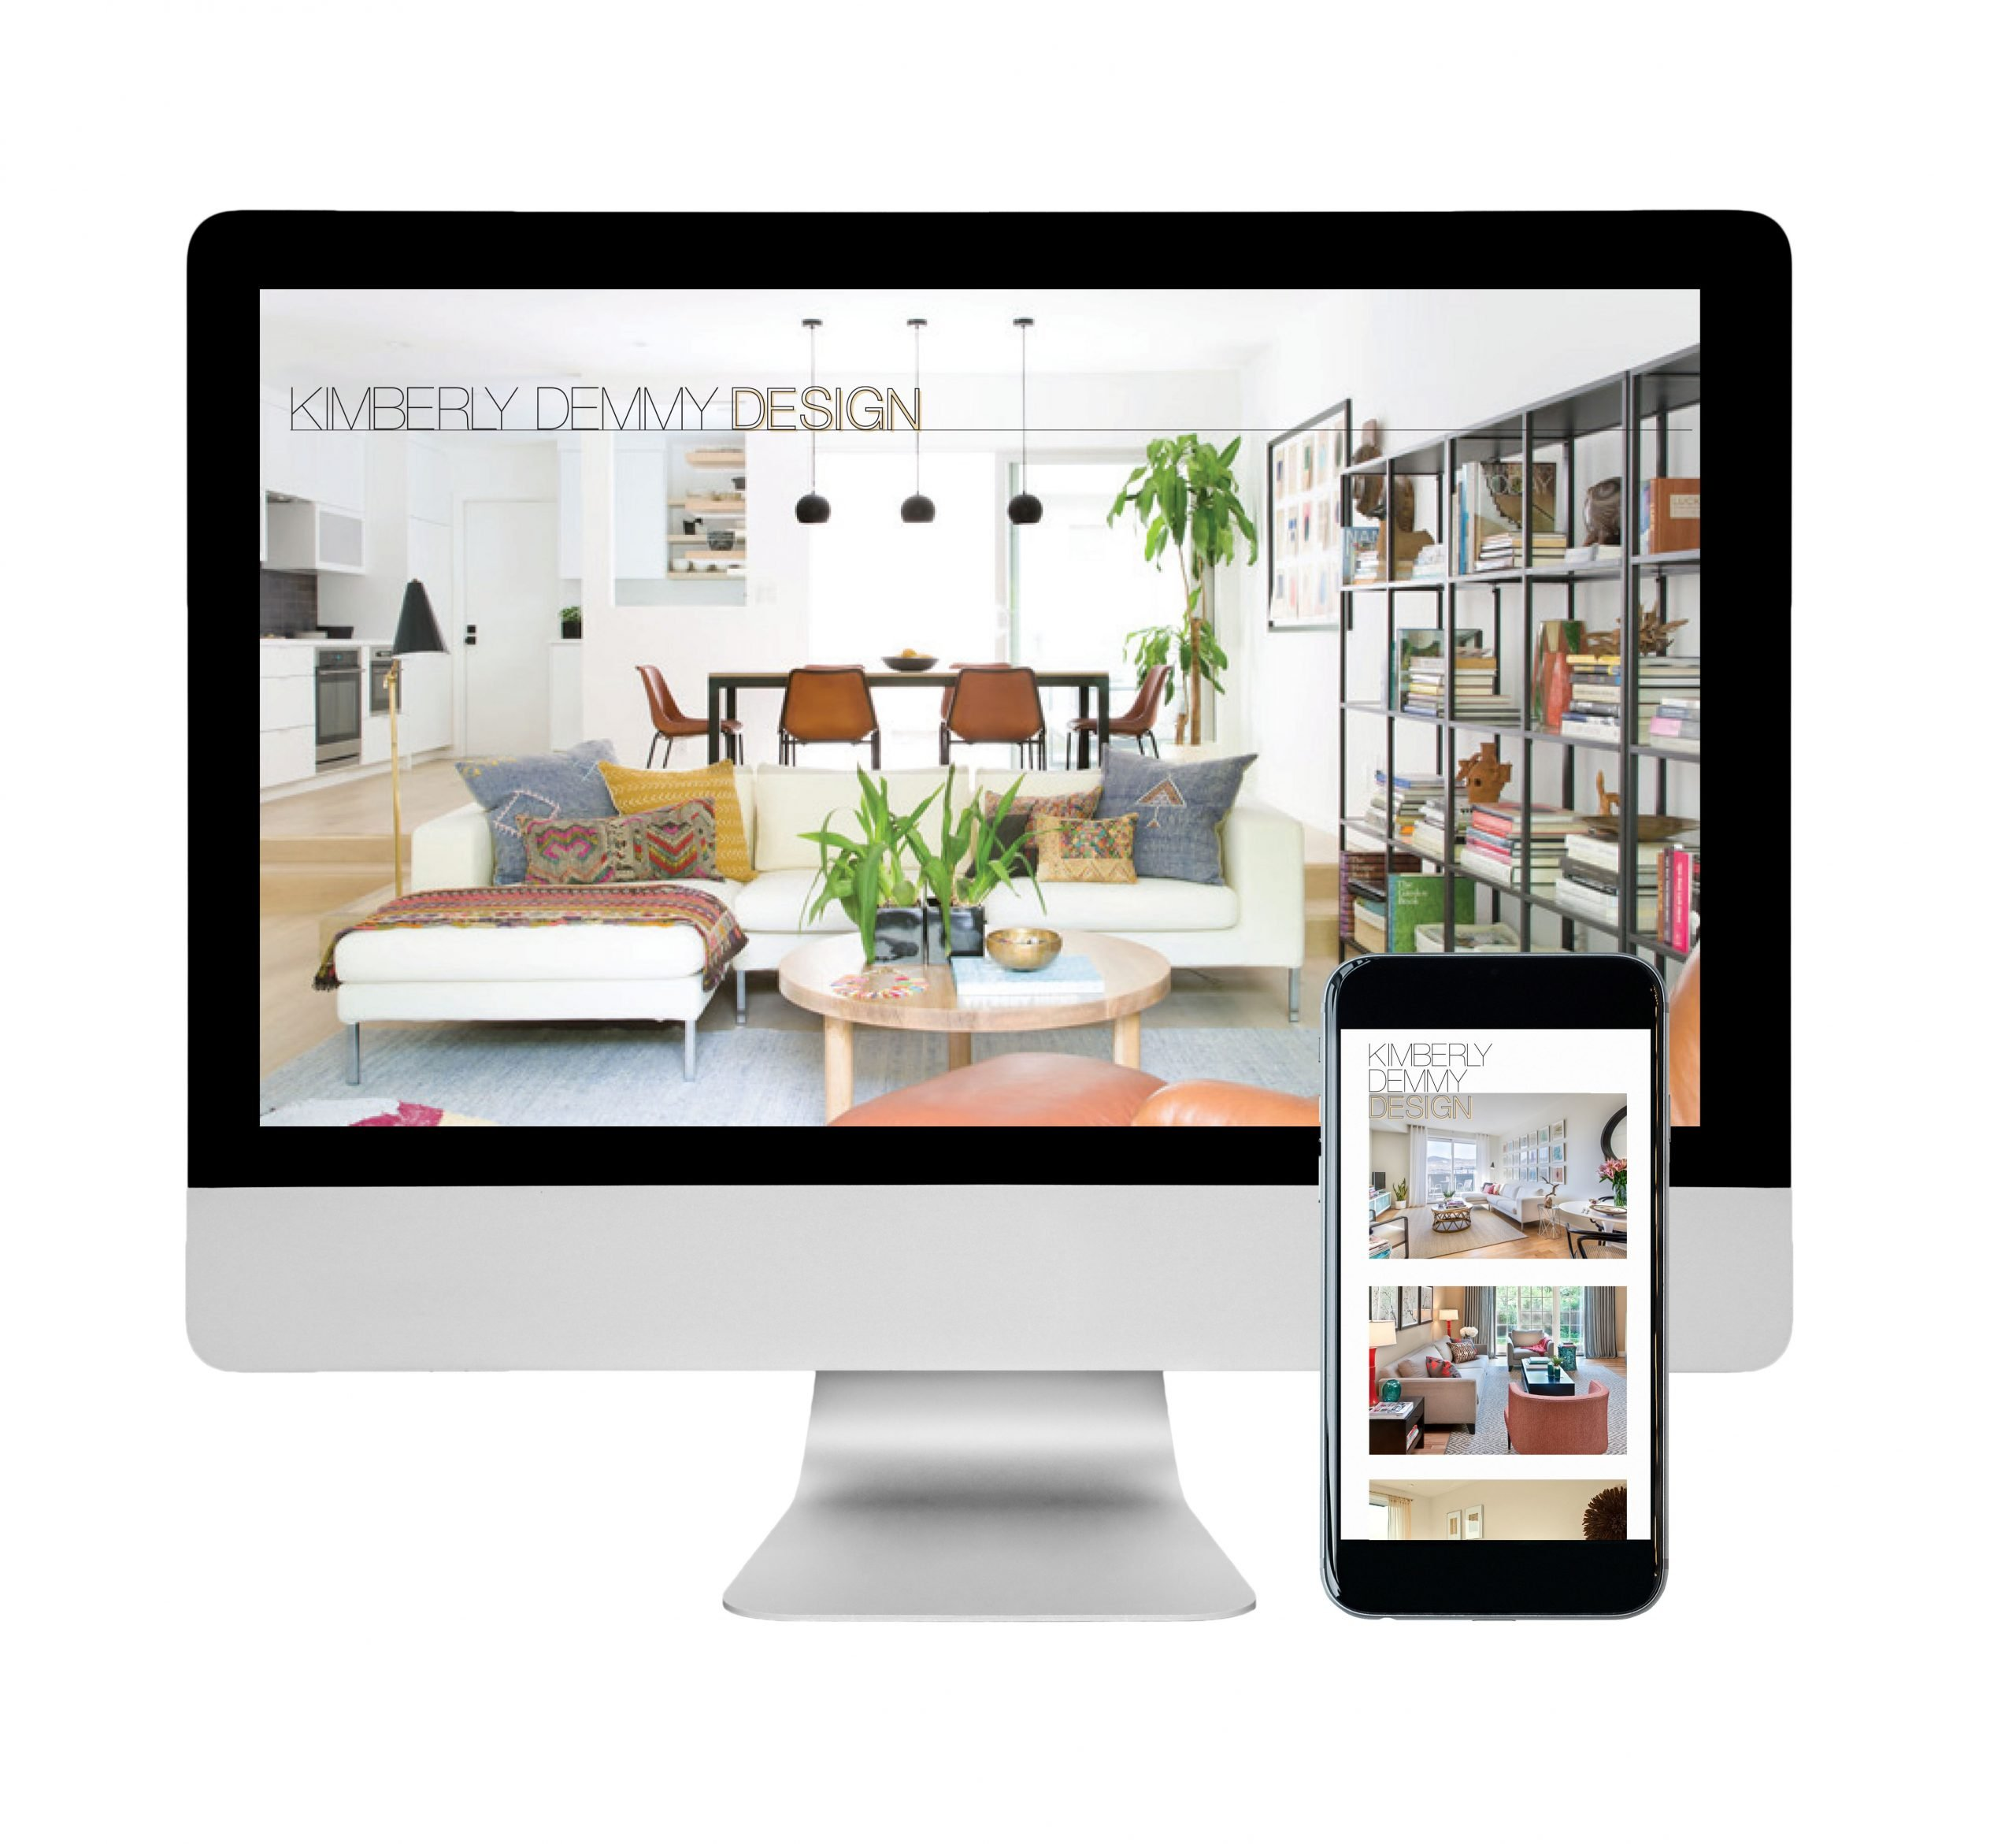 Kimberly Demmy Design website design